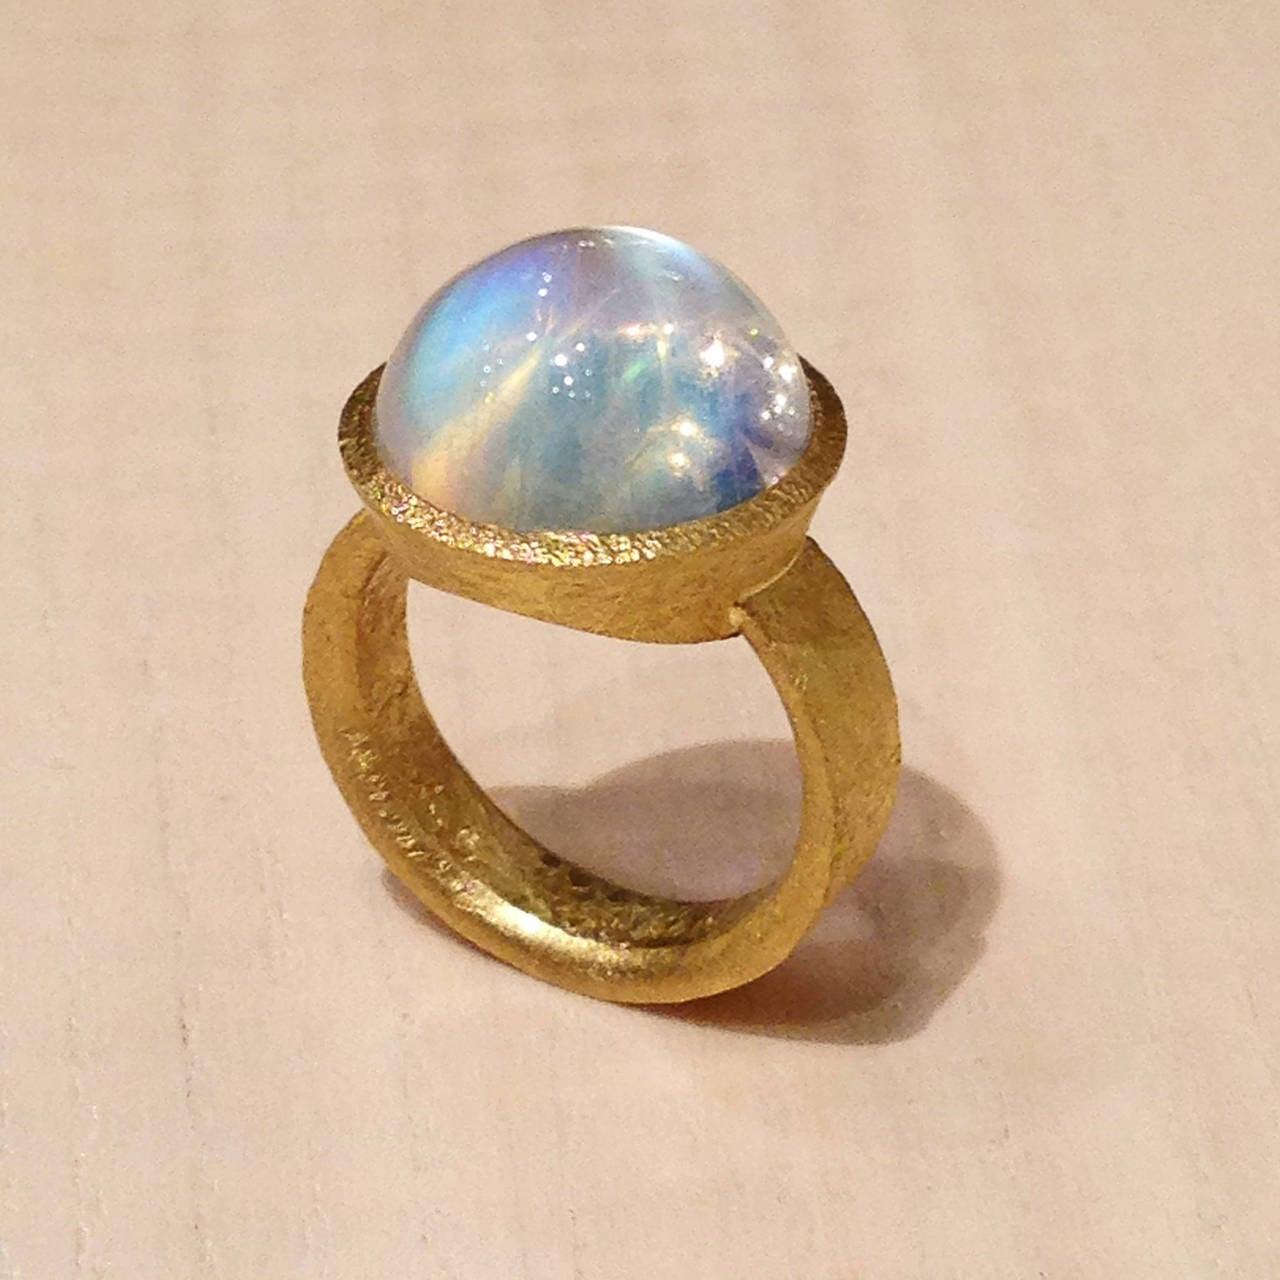 devta doolan exceptional quality rainbow moonstone gold